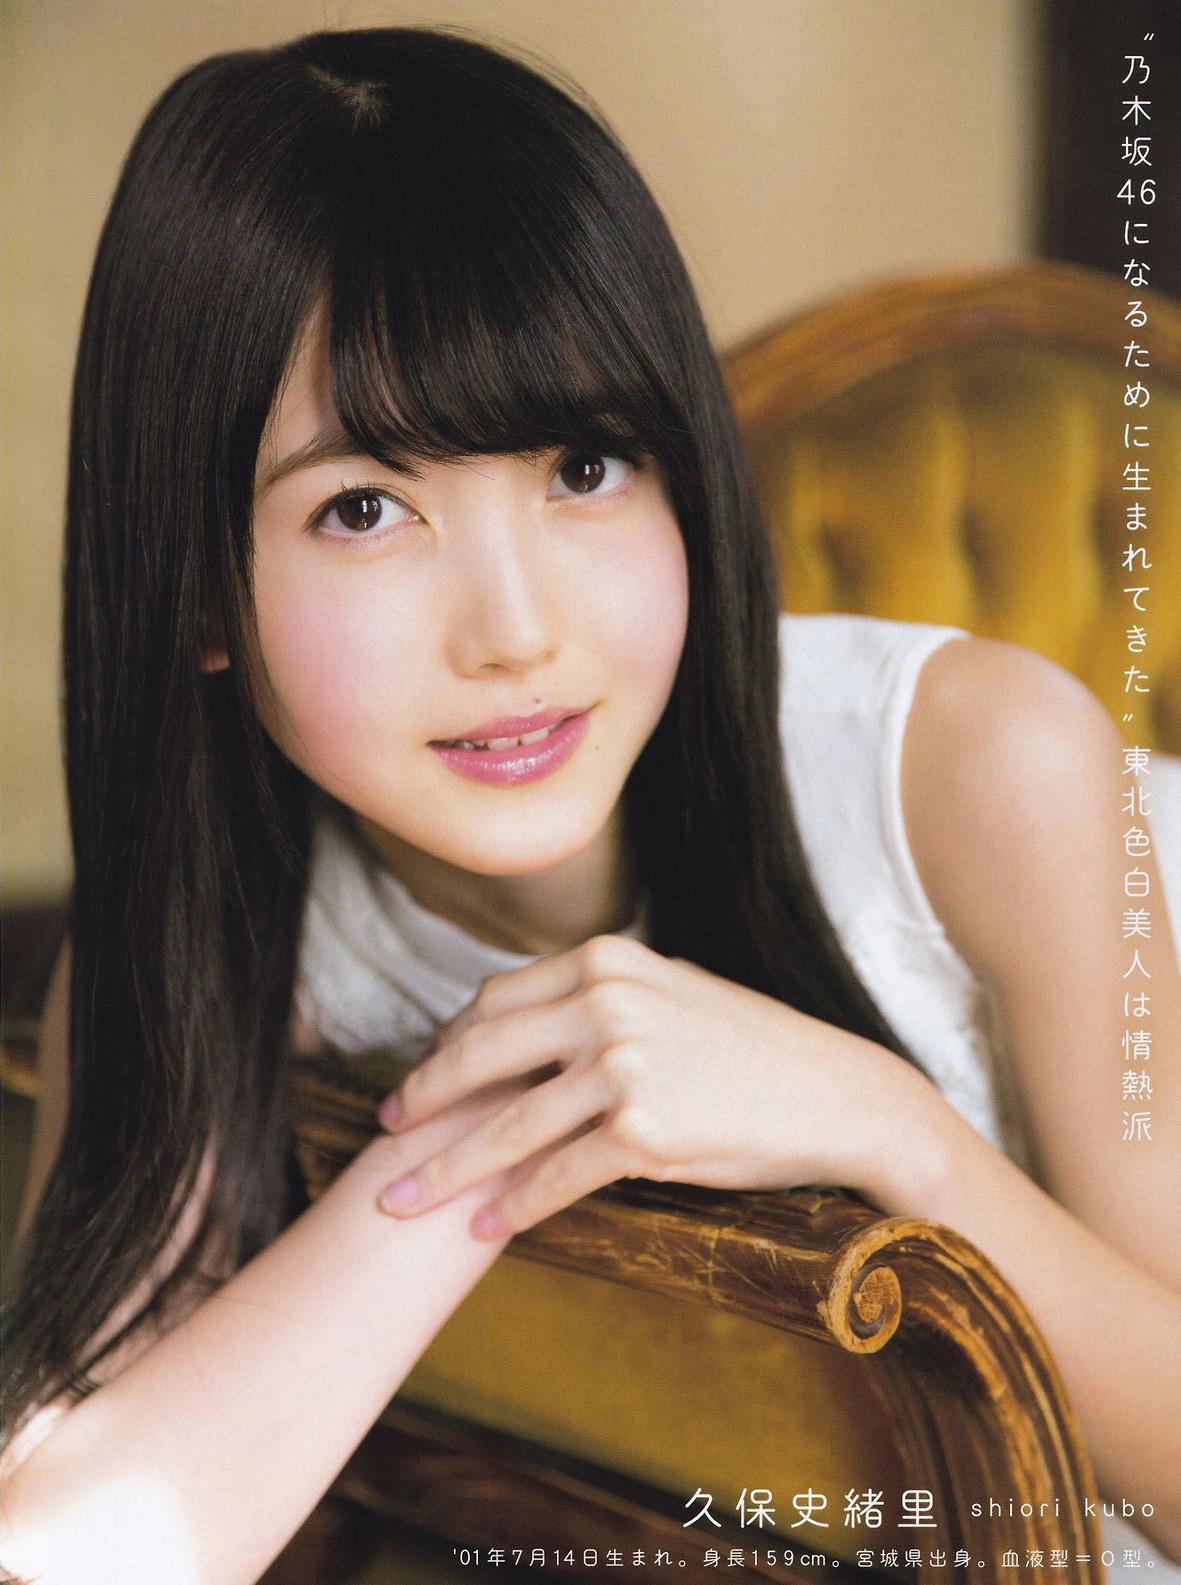 Nogizaka46 3rd Generation, UTB+ 2017.11 Vol.40 (アップトゥボーイ プラス 2017年40号)